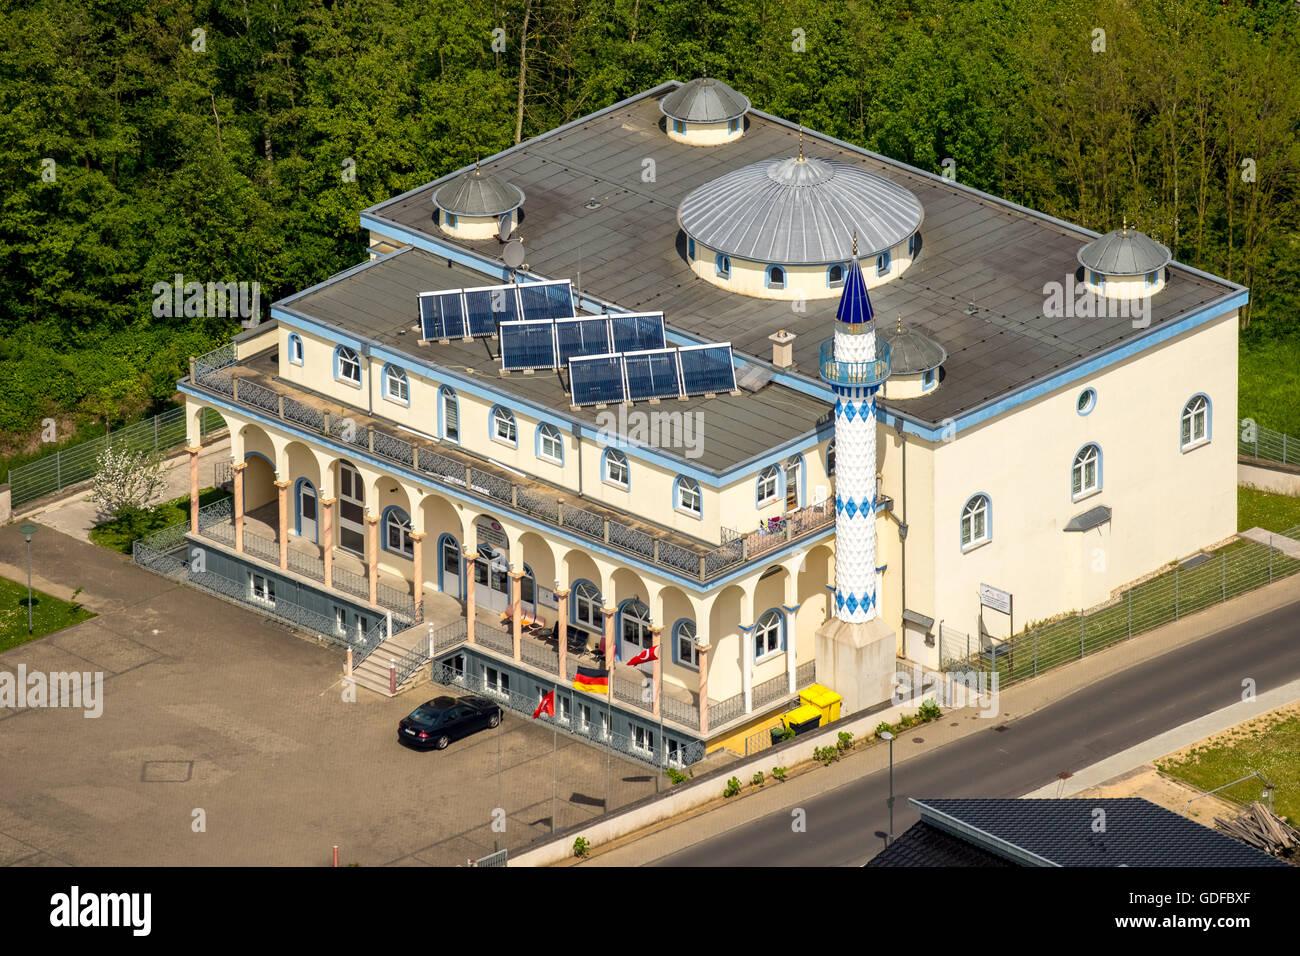 Aerial view, Fatih Mosque, Baesweiler, Niederrhein, North Rhine-Westphalia, Germany - Stock Image